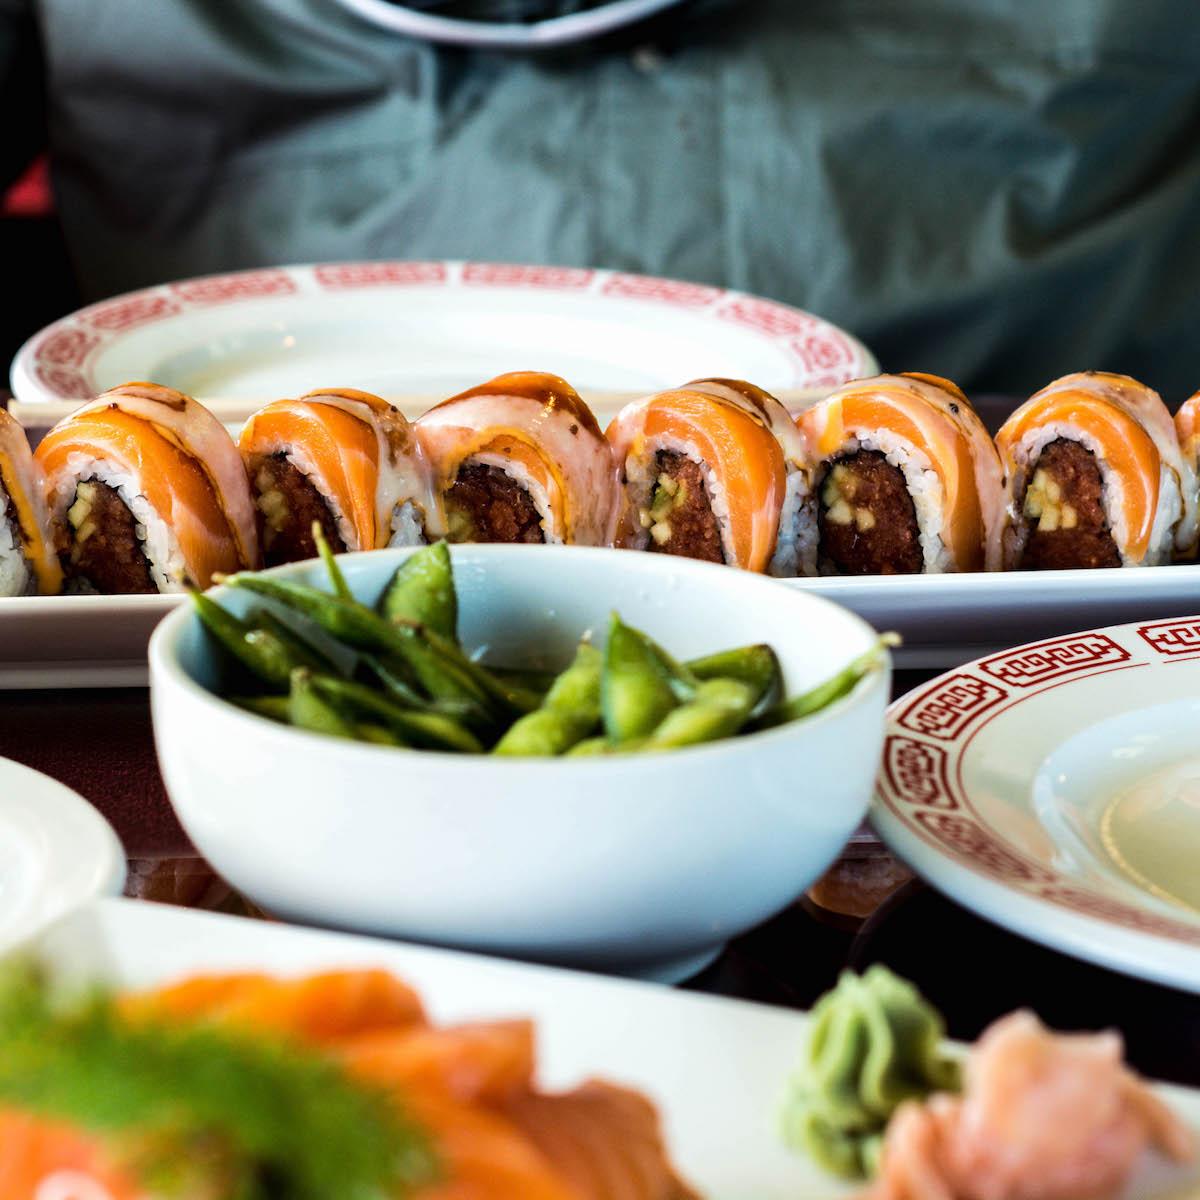 Sushi Lunch Top 10 Sushi Restaurants in München Liste